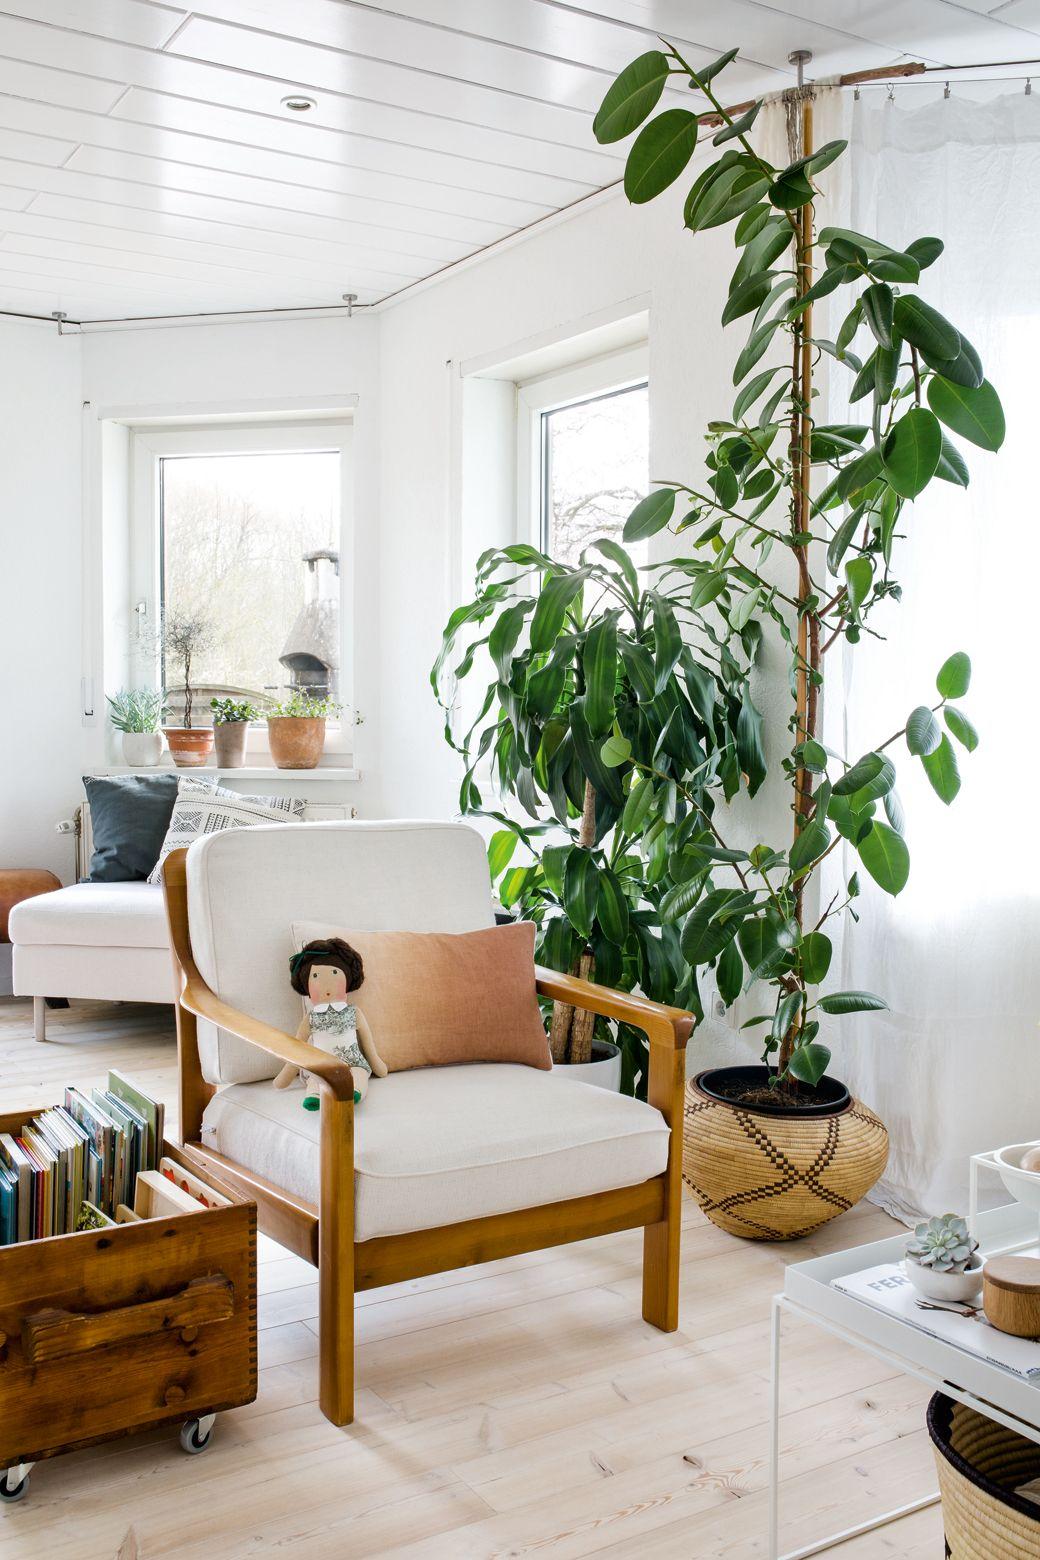 6 Ways To Decorate With Plants Plant decor, Plants